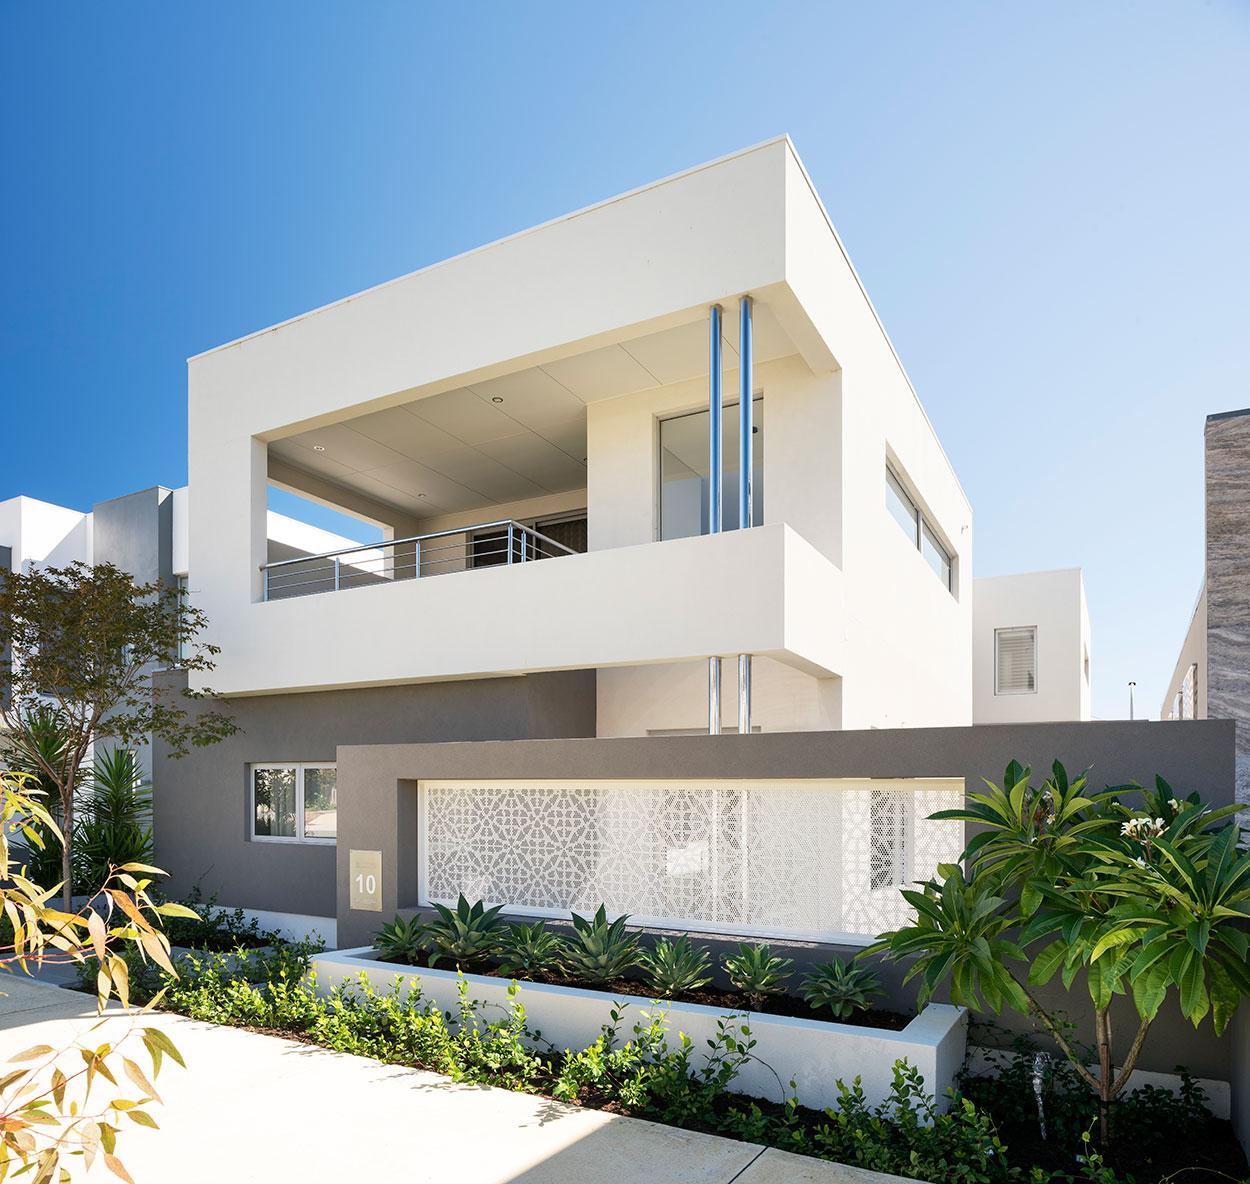 132 casas bonitas modernas fotos lindas for Casa moderna 64